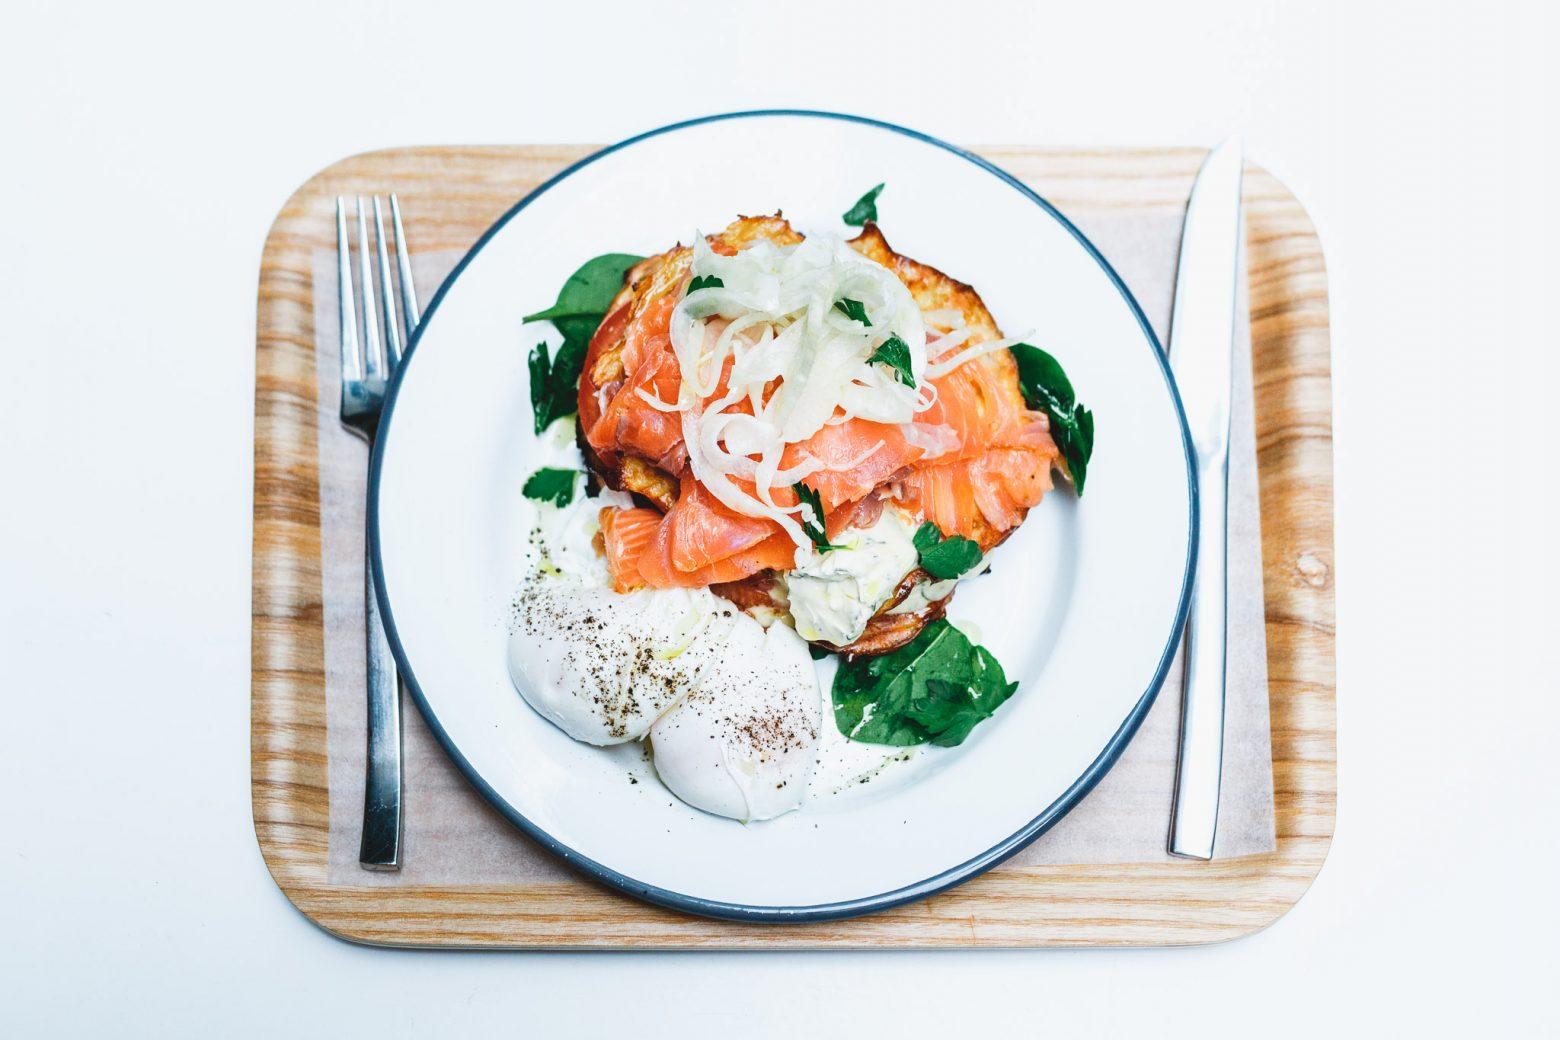 melbourne-food-photographer-williams-bowery-salmon